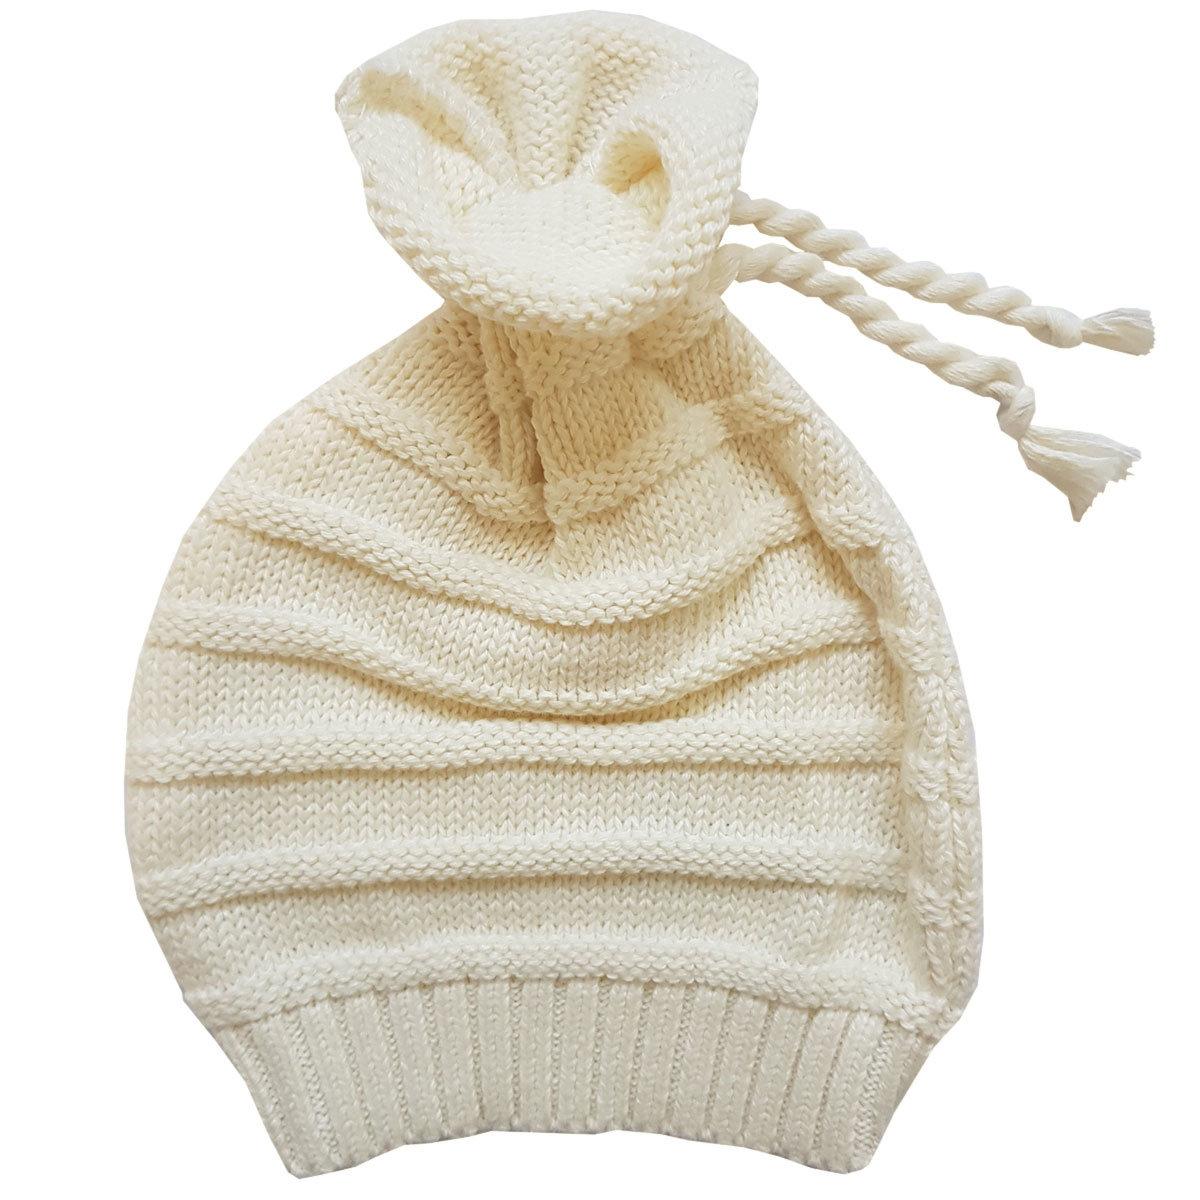 Шапочка для девочки Папитто вязаная (цвет: бежевый, размер 36-40)